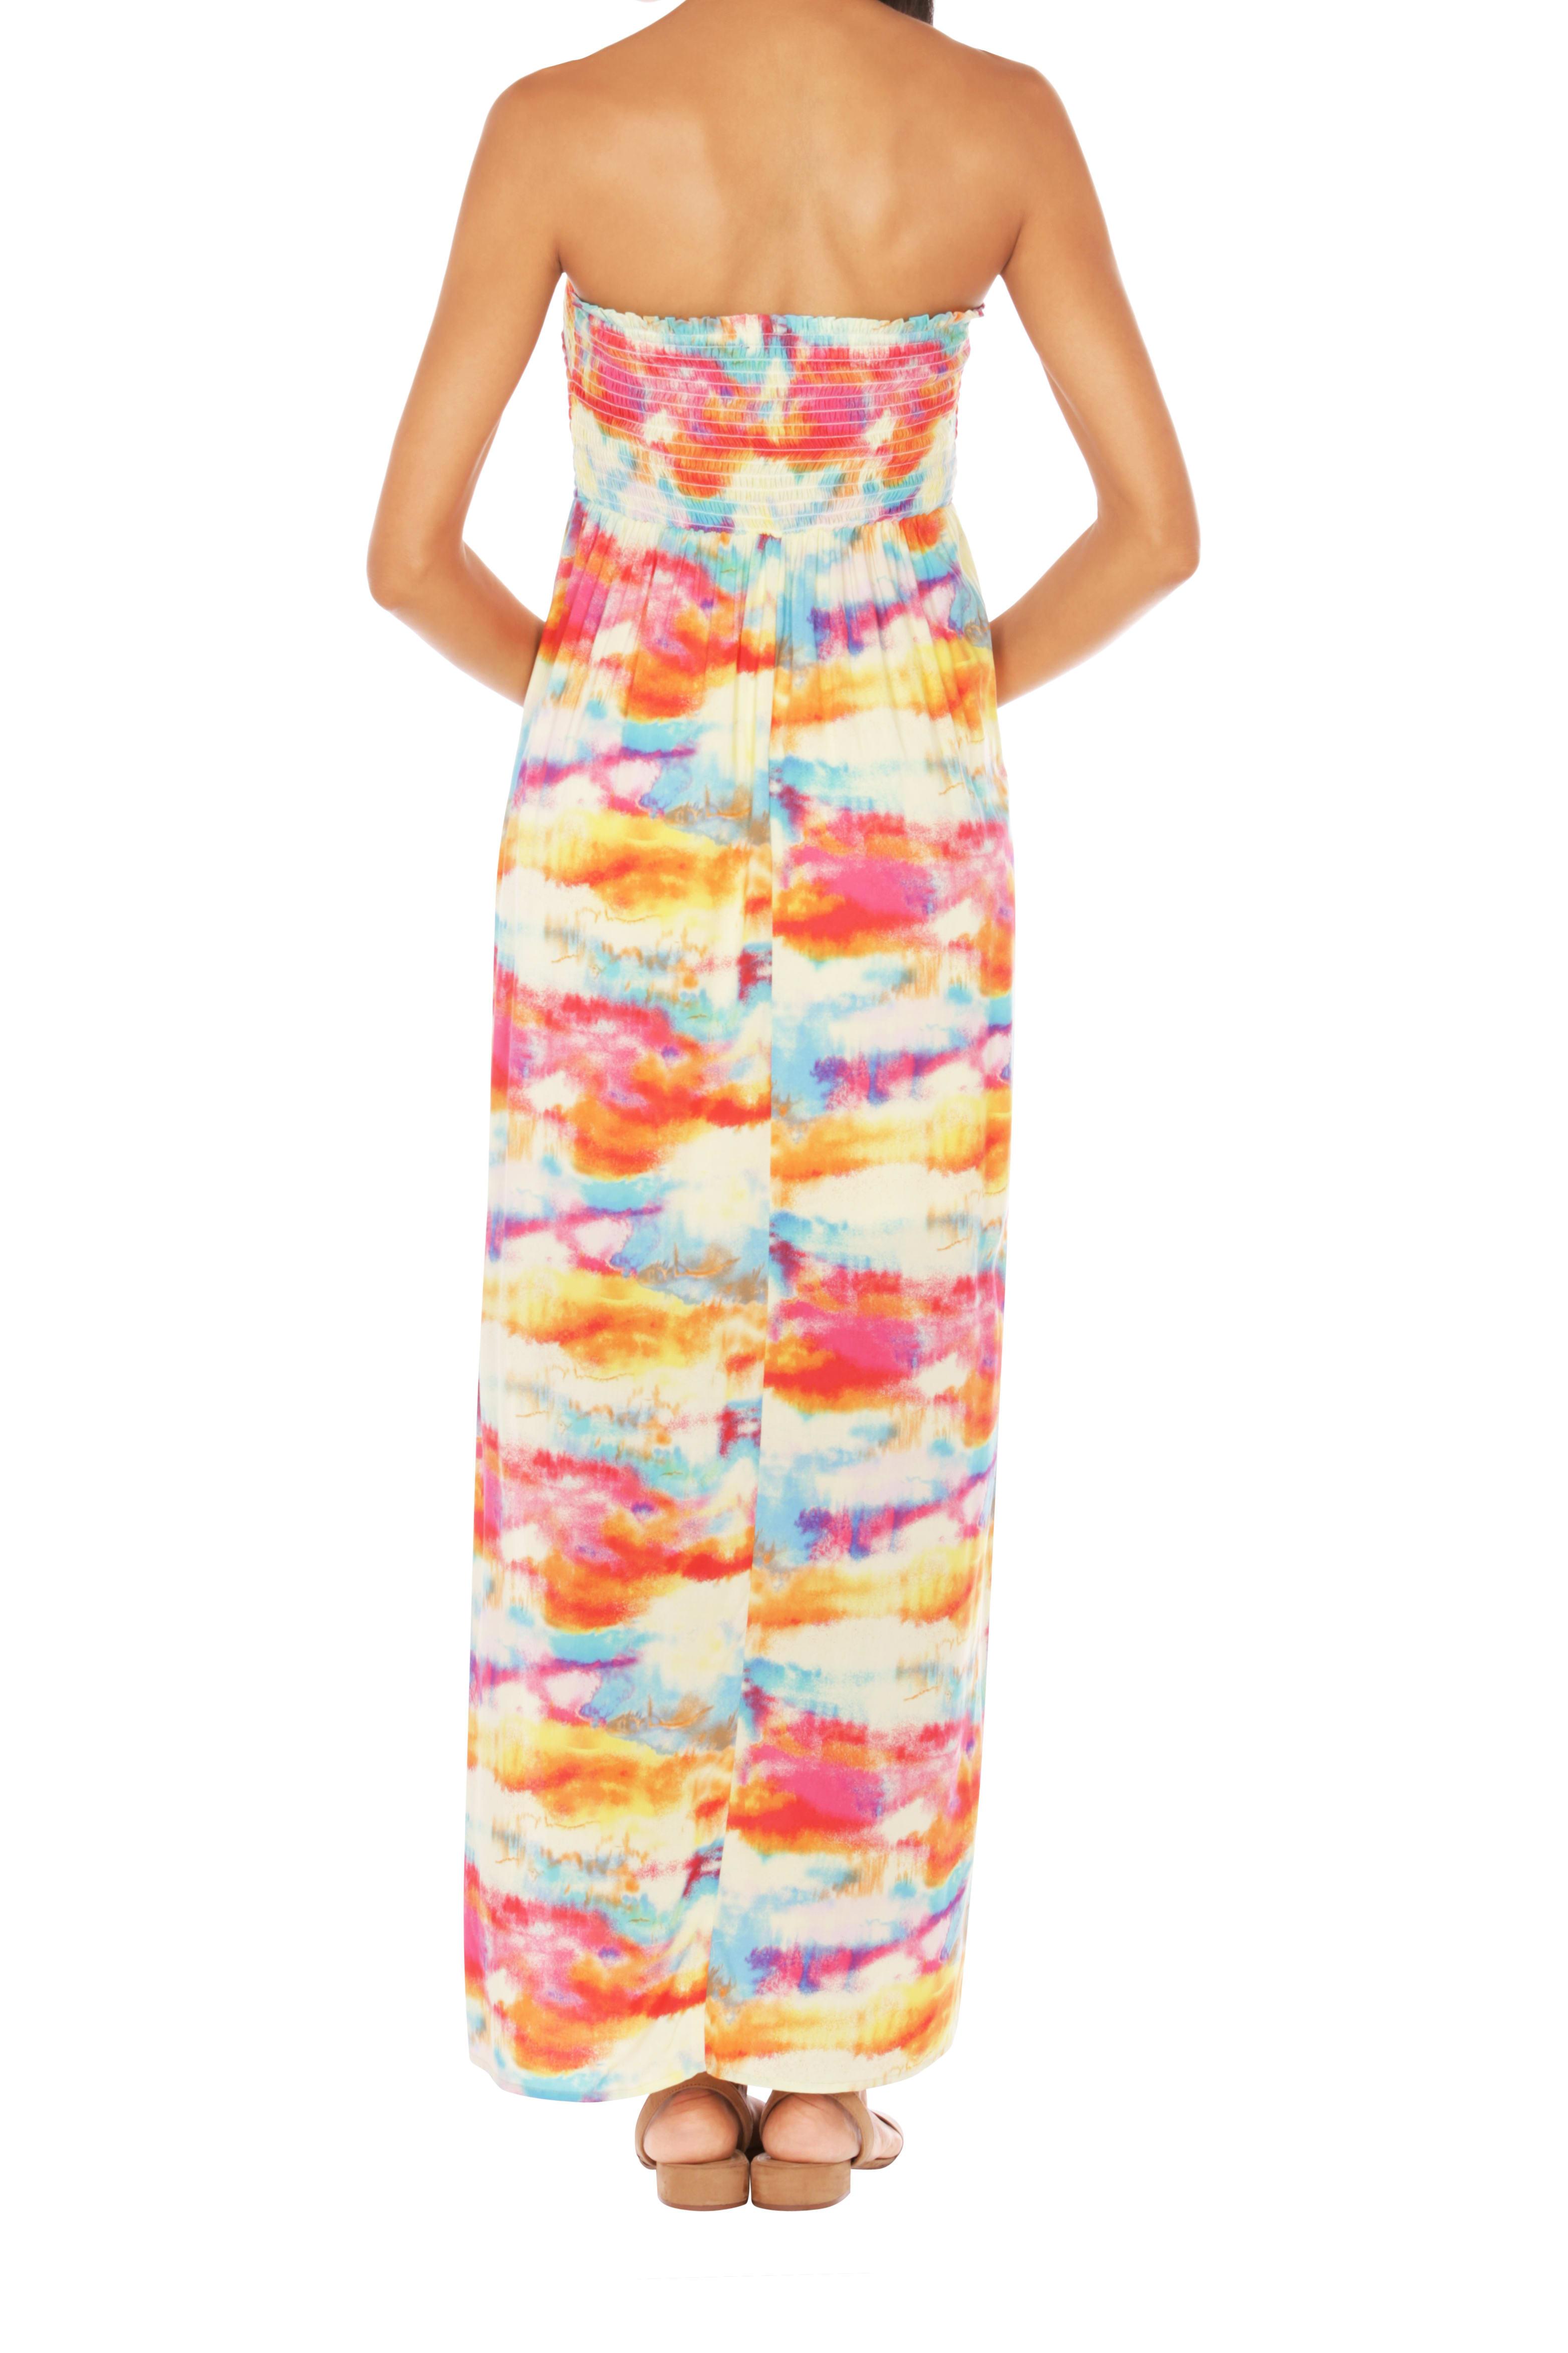 Caribbean Joe® Smocked Maxi Dress - Saffron - Back